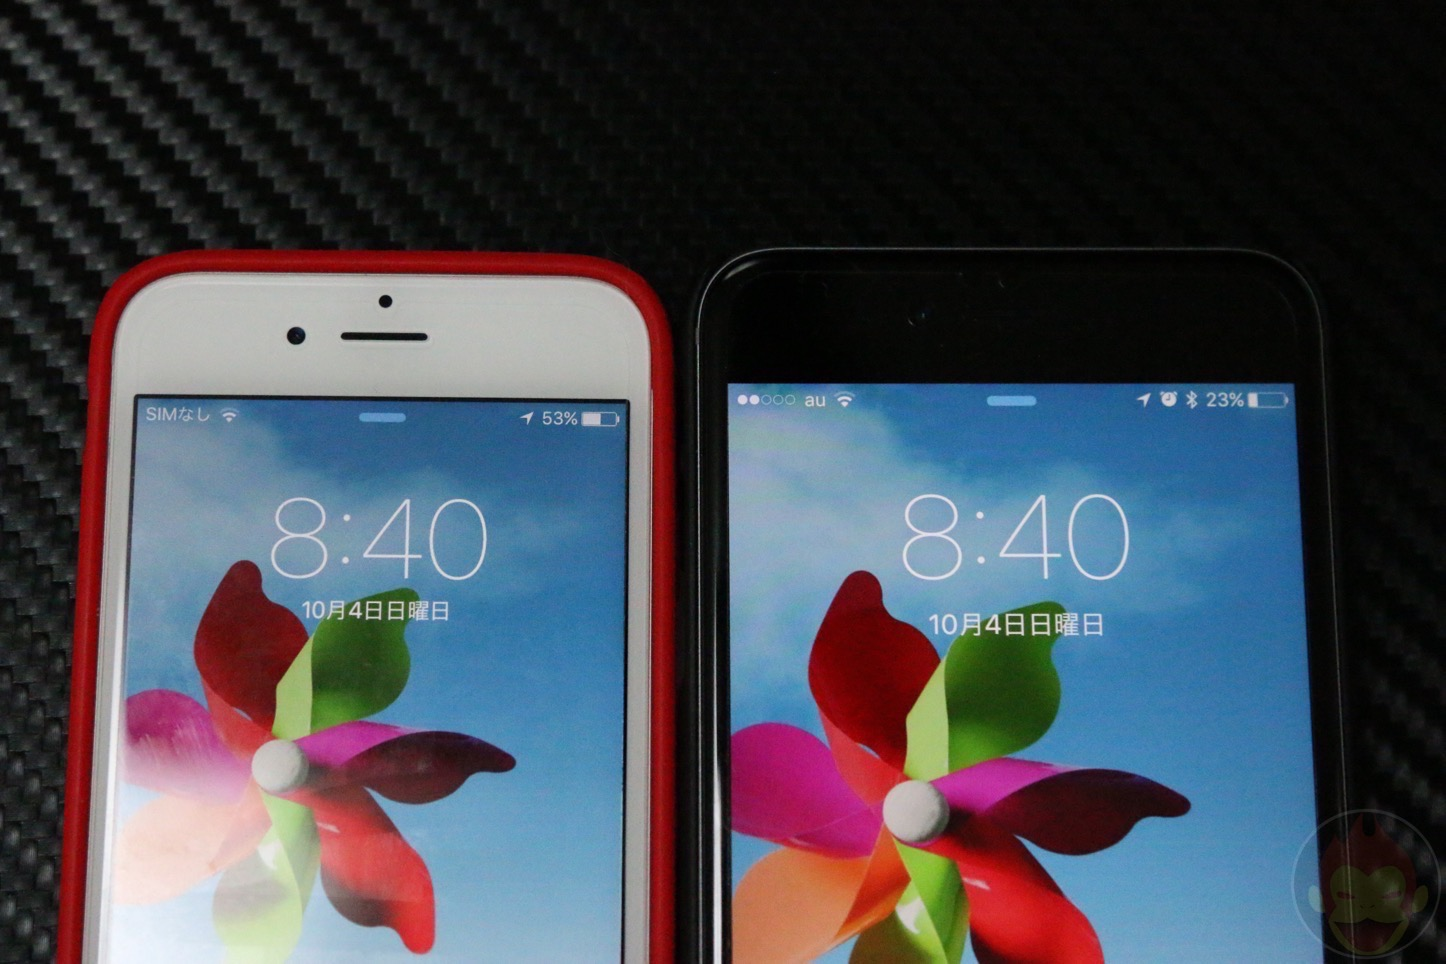 iPhone6s-6splus-battery-life-14.JPG